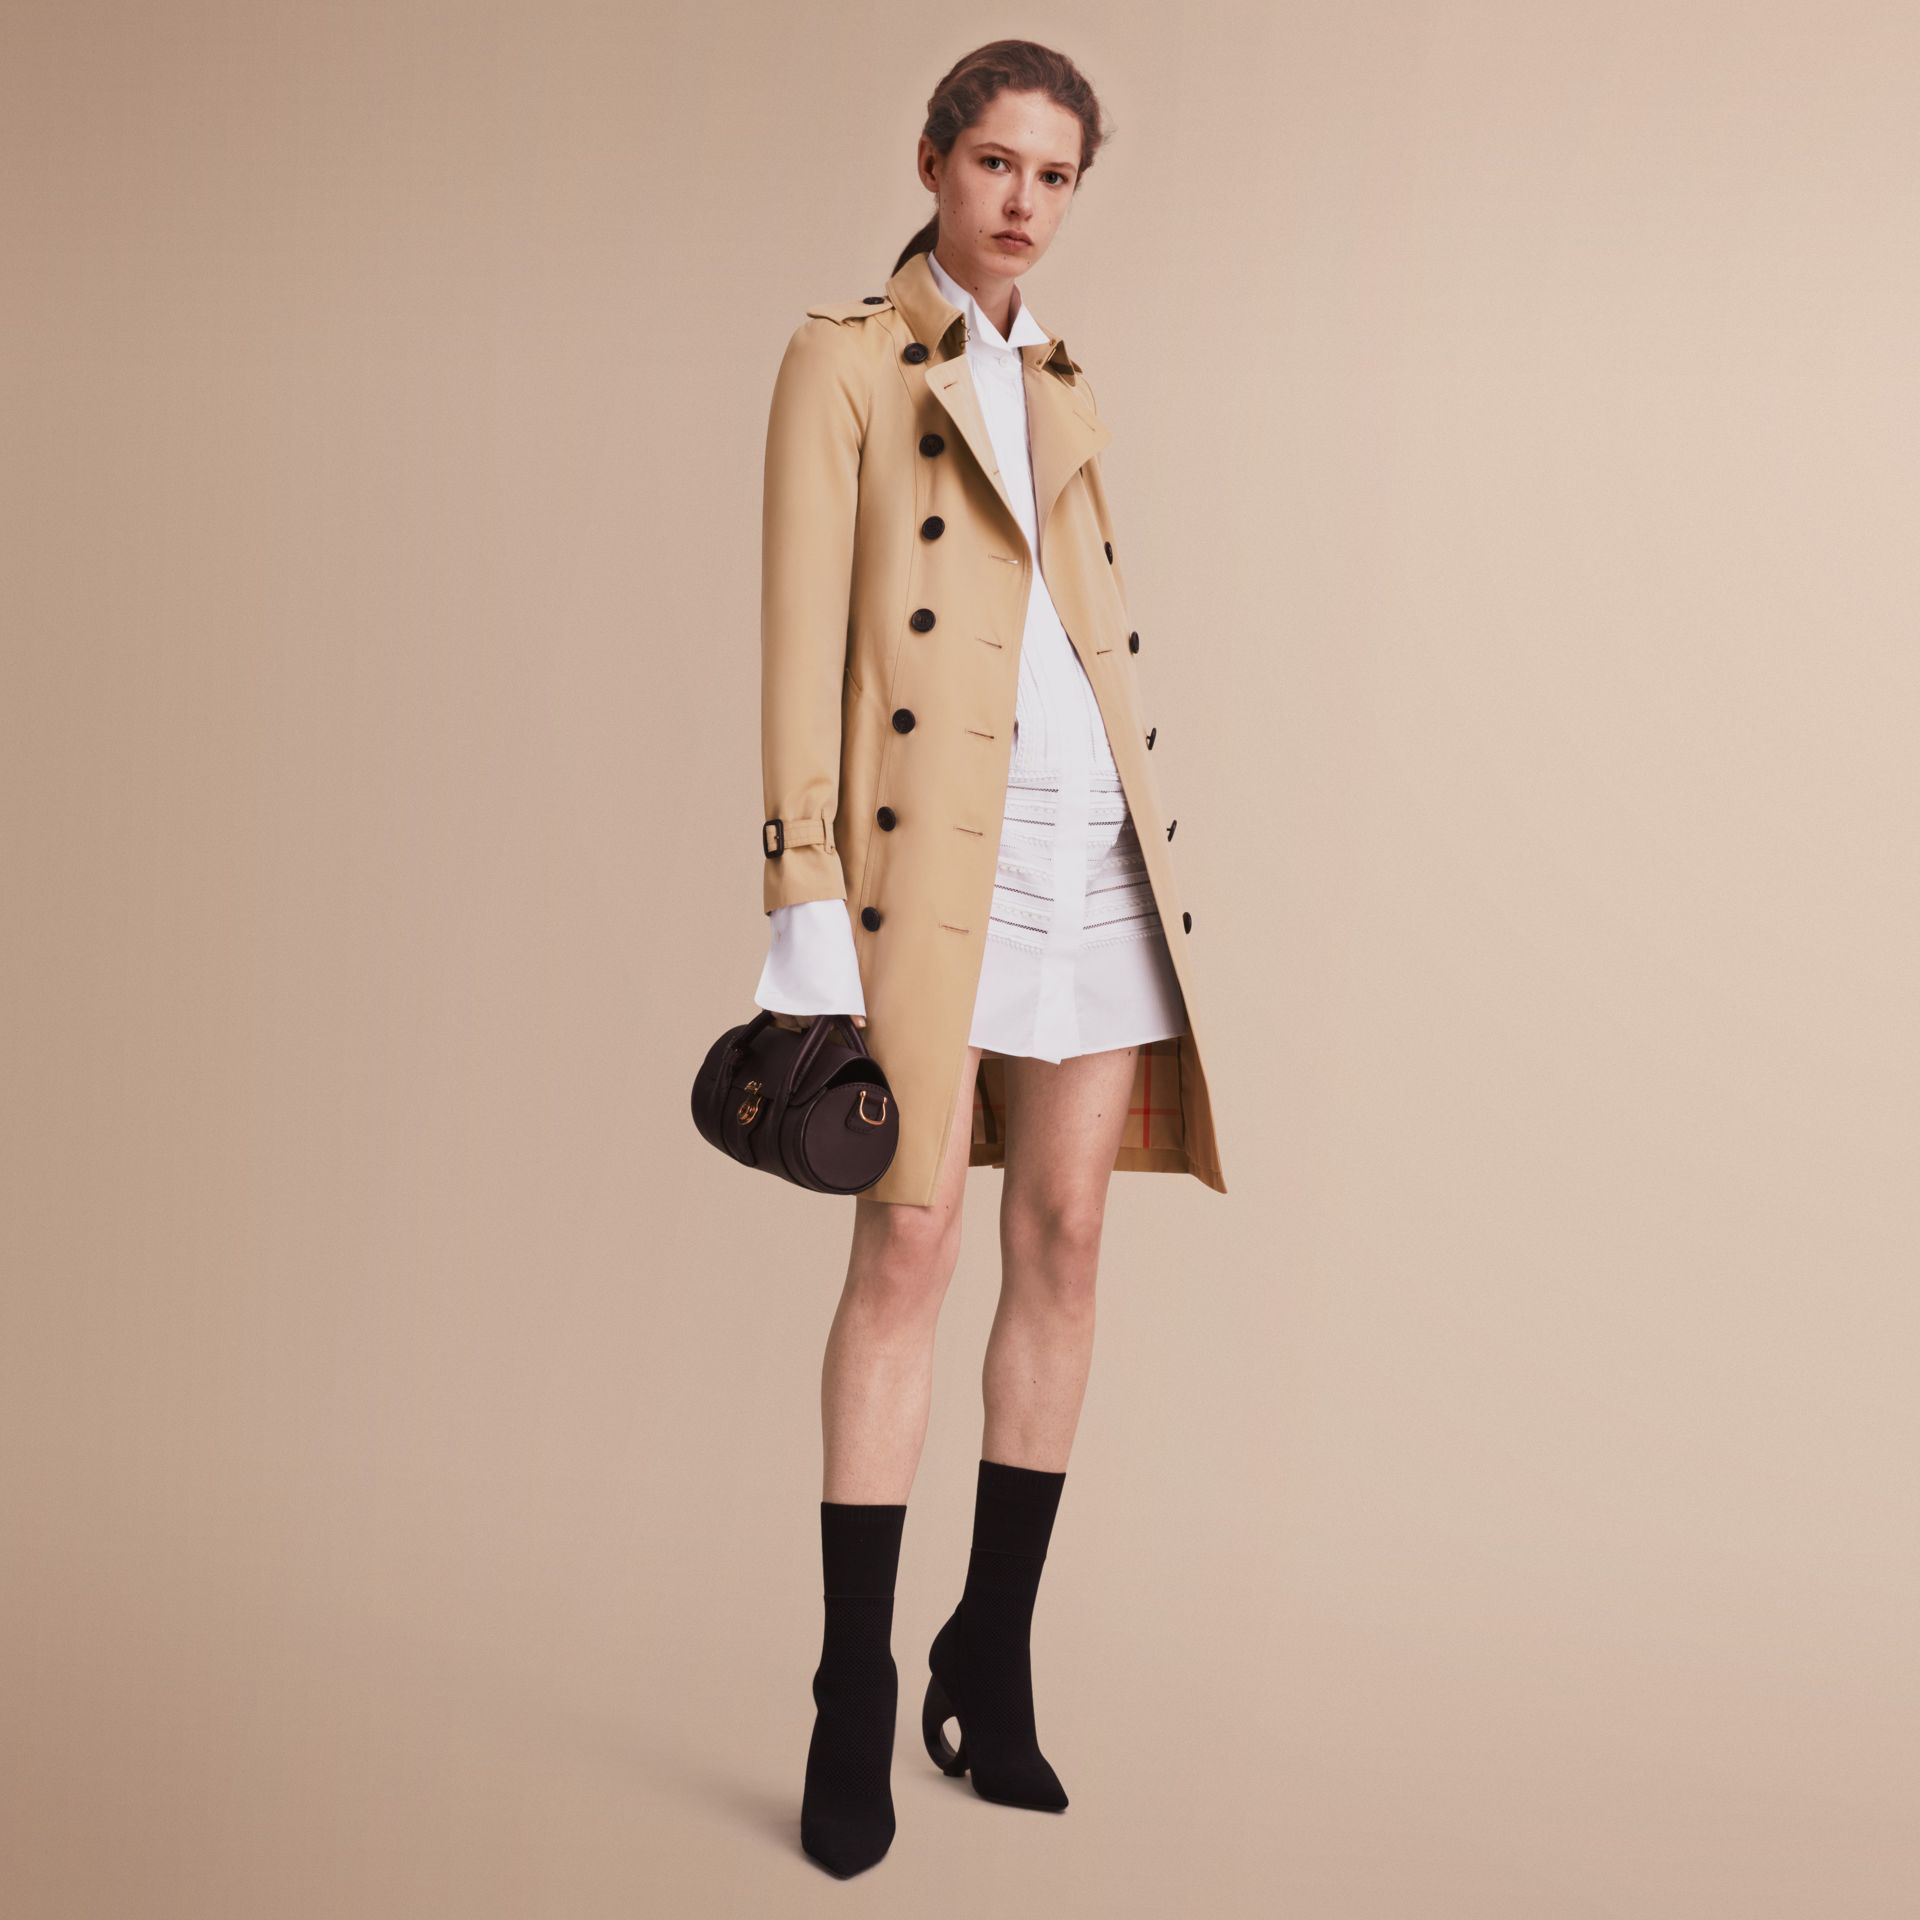 The Sandringham - Trench coat Heritage longo Mel - galeria de imagens 1